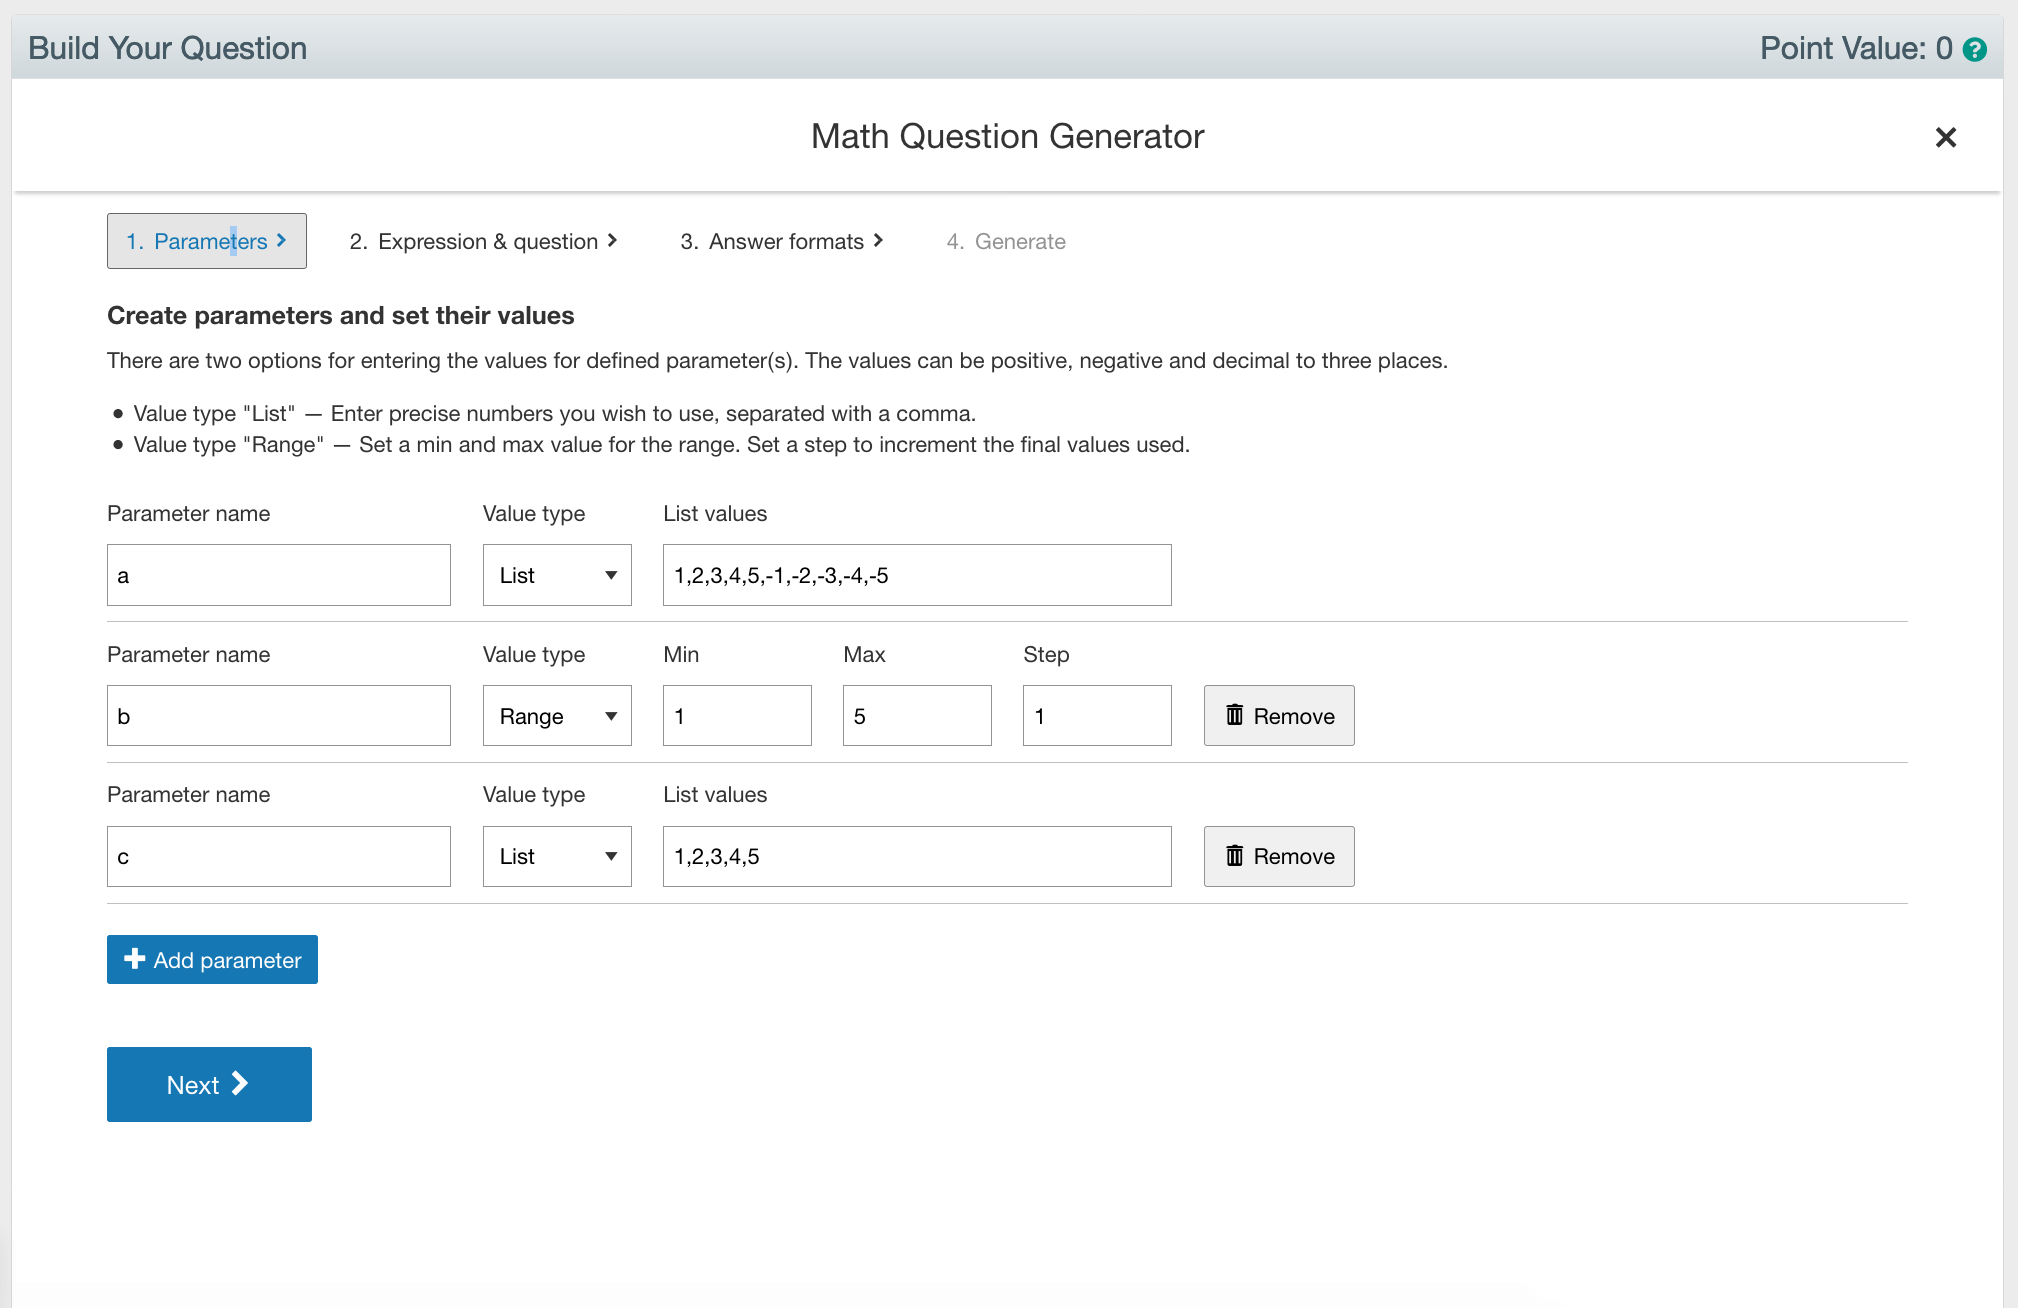 Math Question Generator Step 1